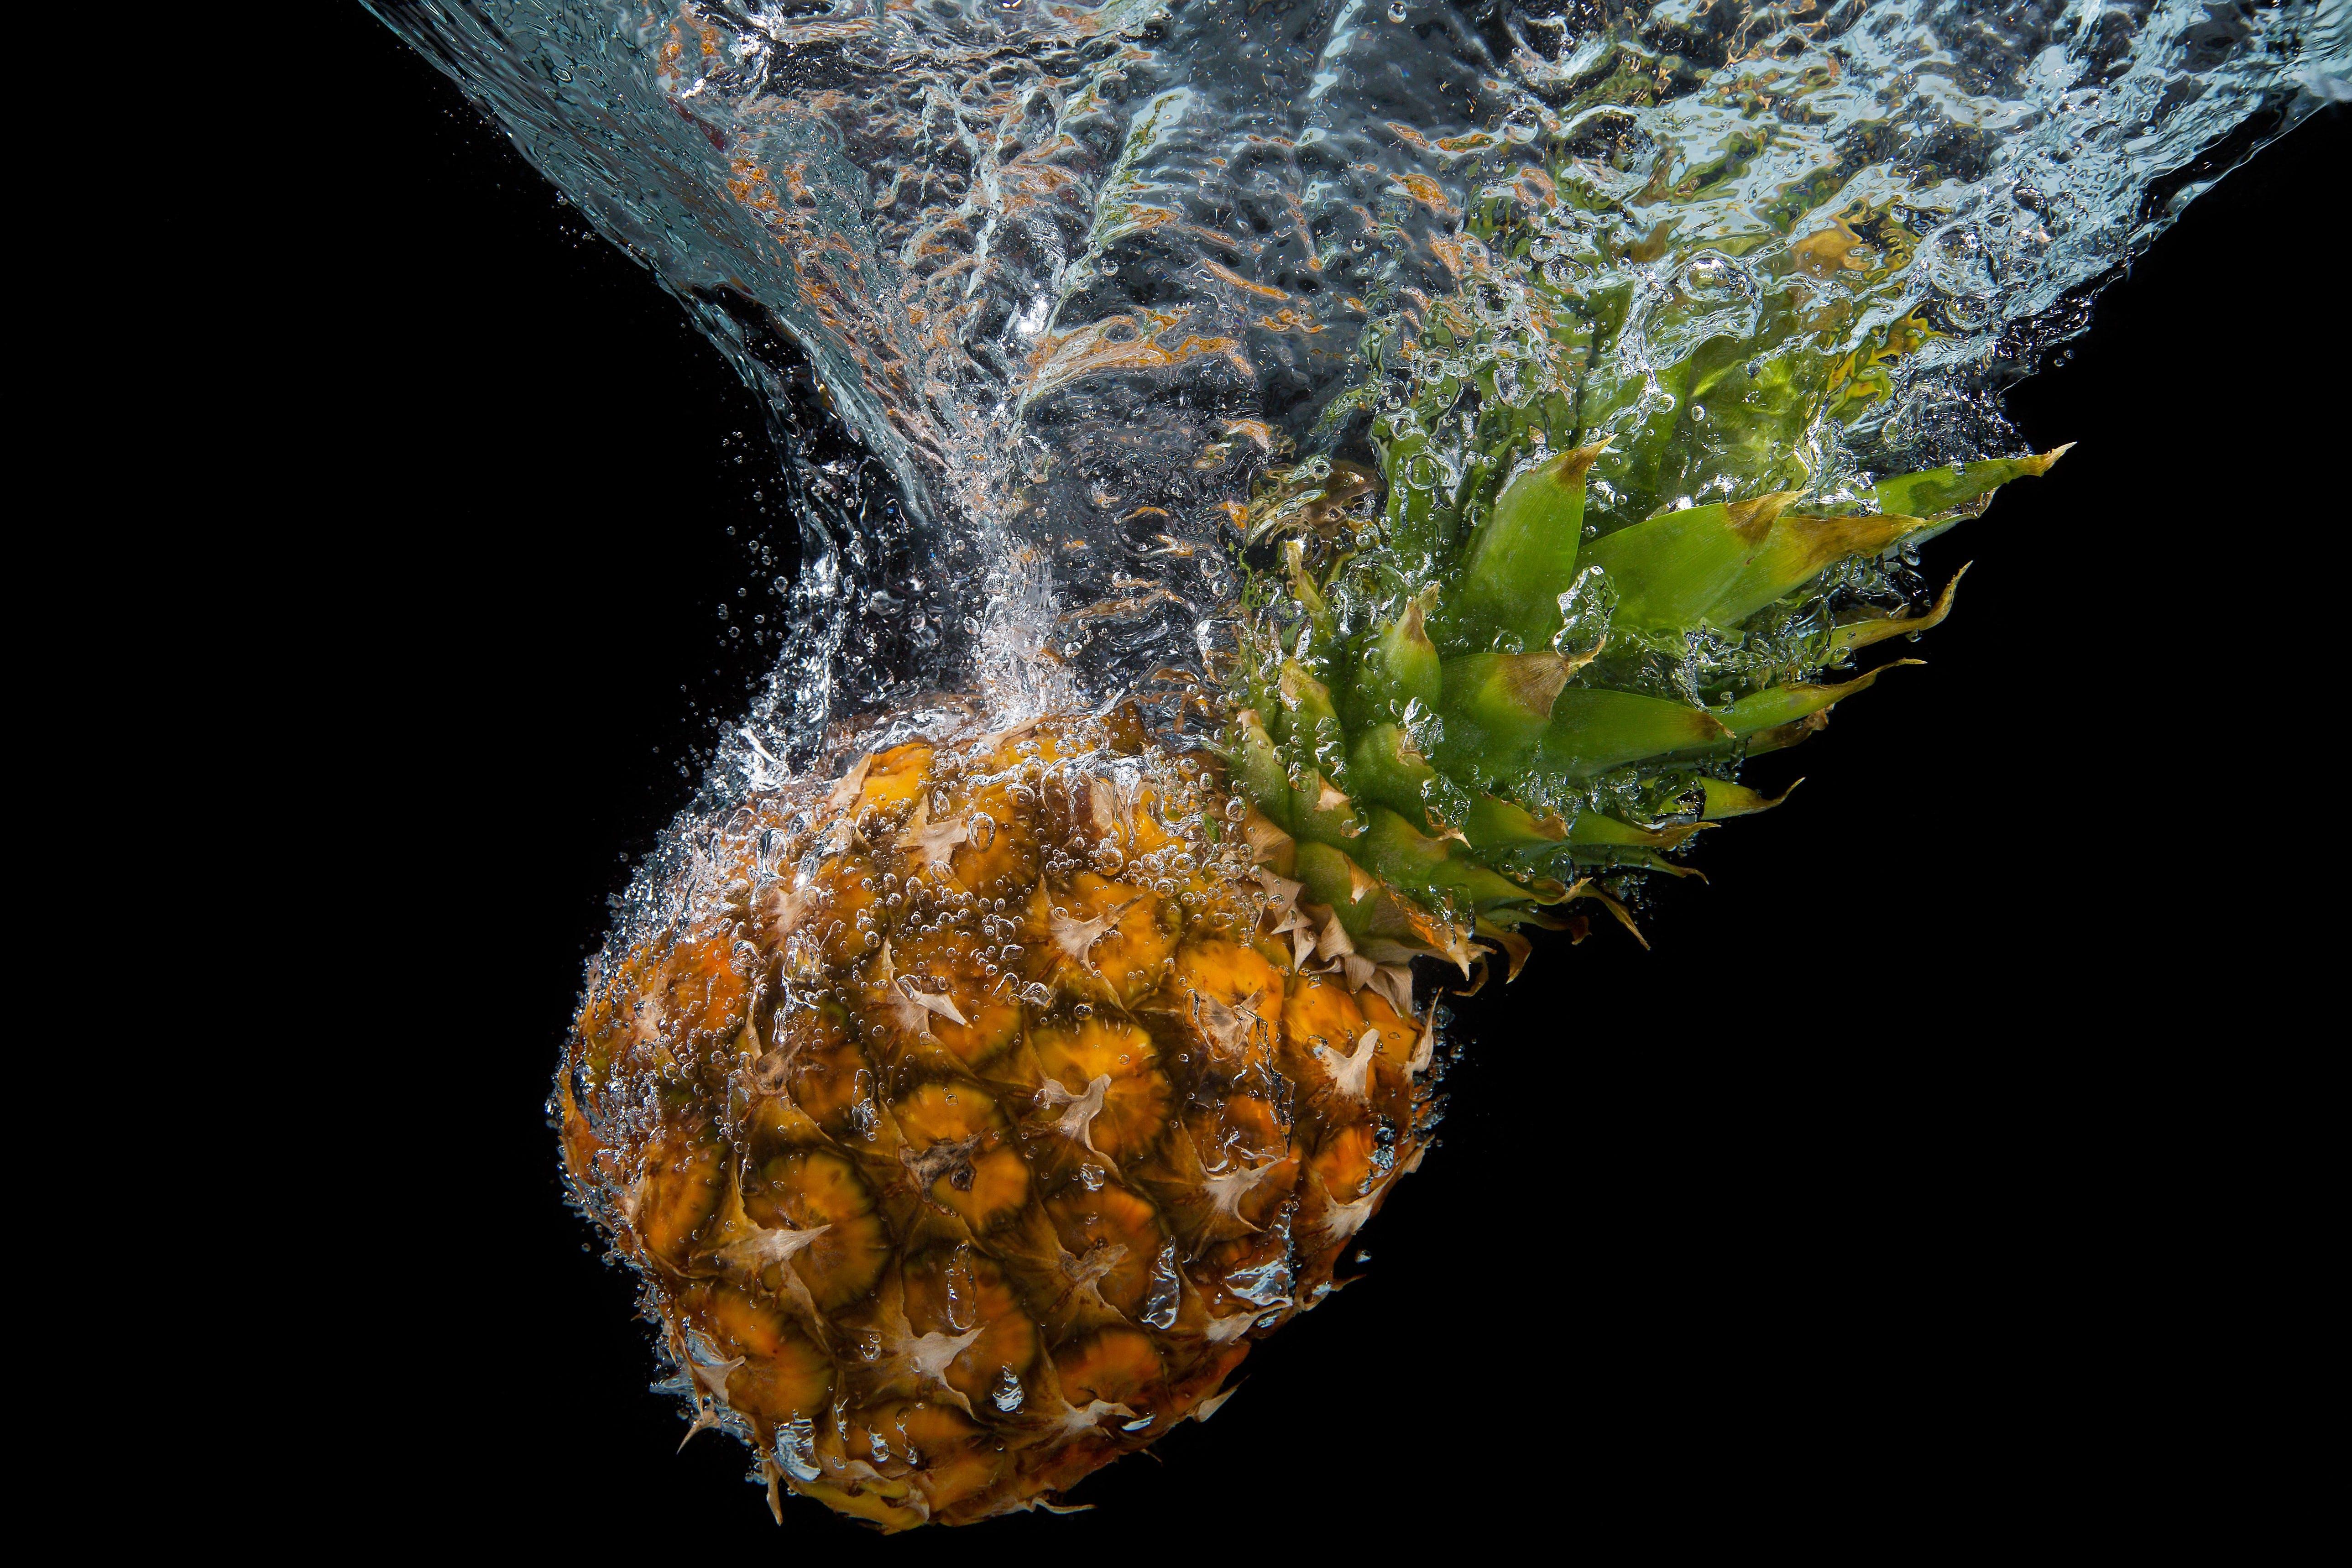 Orange Pineapple on Water Digital Wallpaper